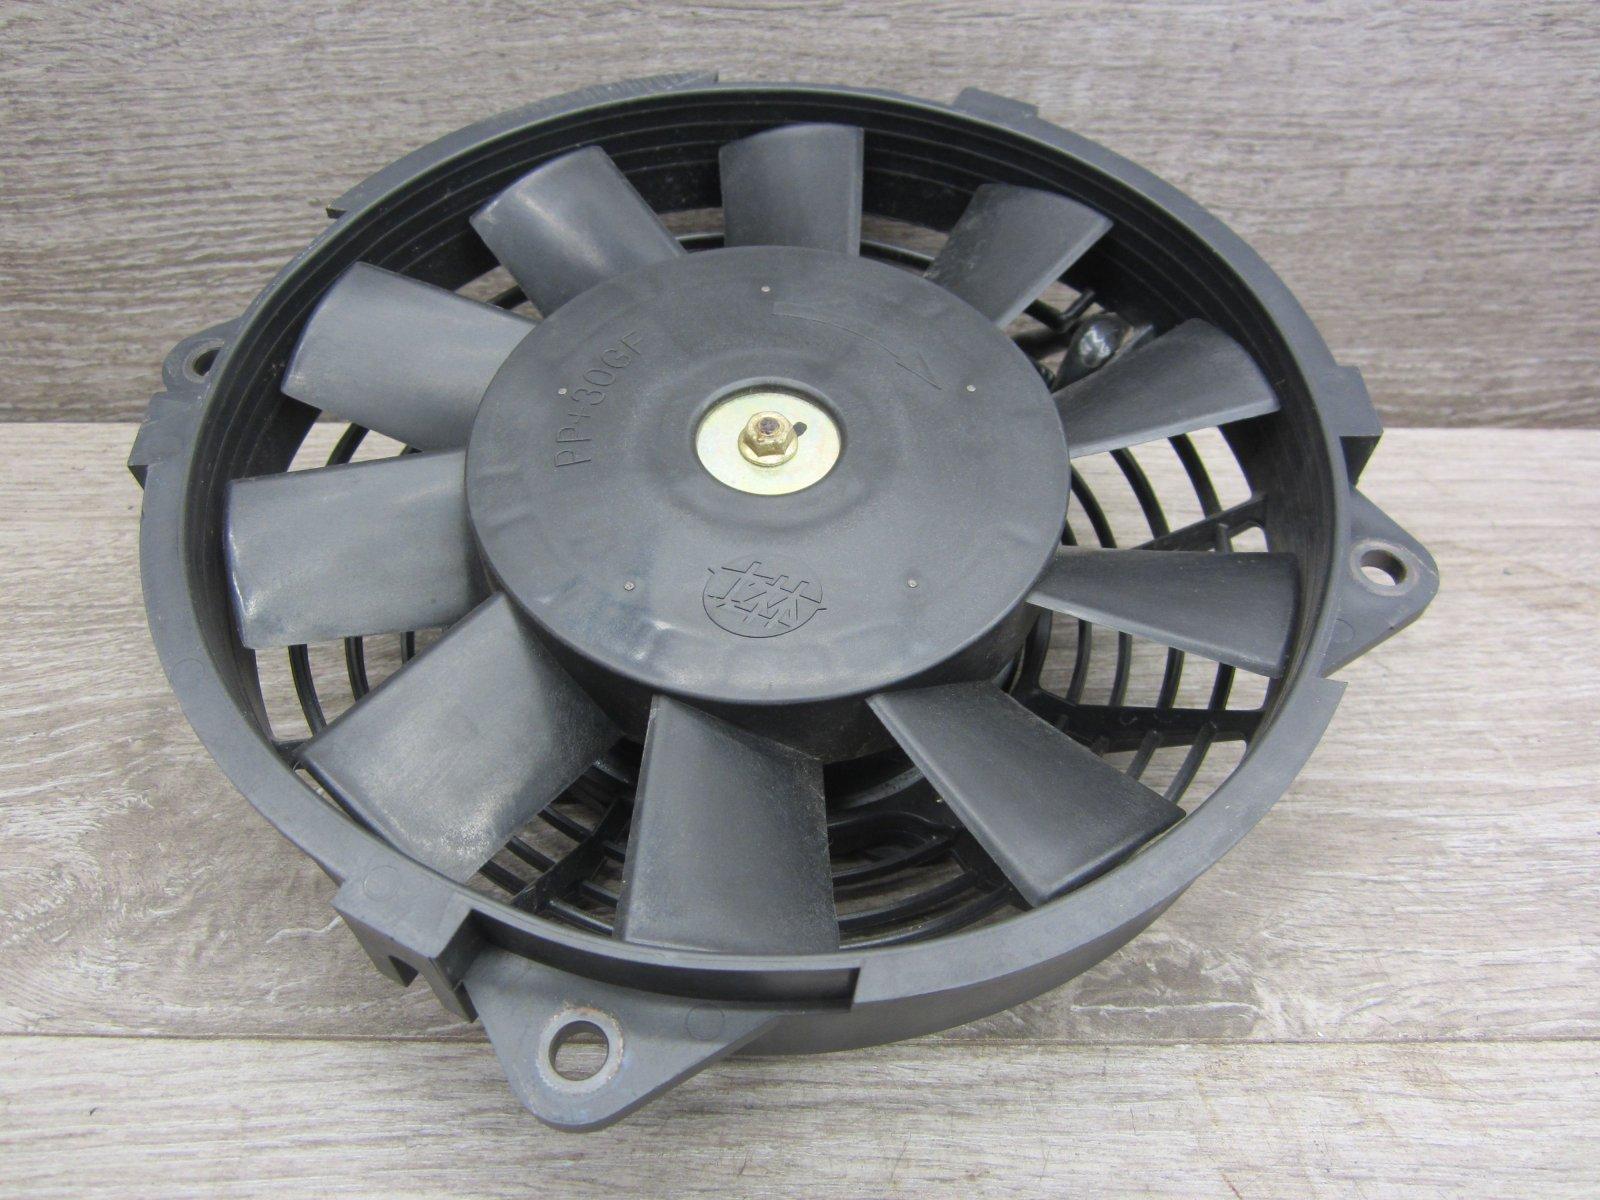 quad tgb blade 425 blower wheel blower fan for coolant tgb. Black Bedroom Furniture Sets. Home Design Ideas